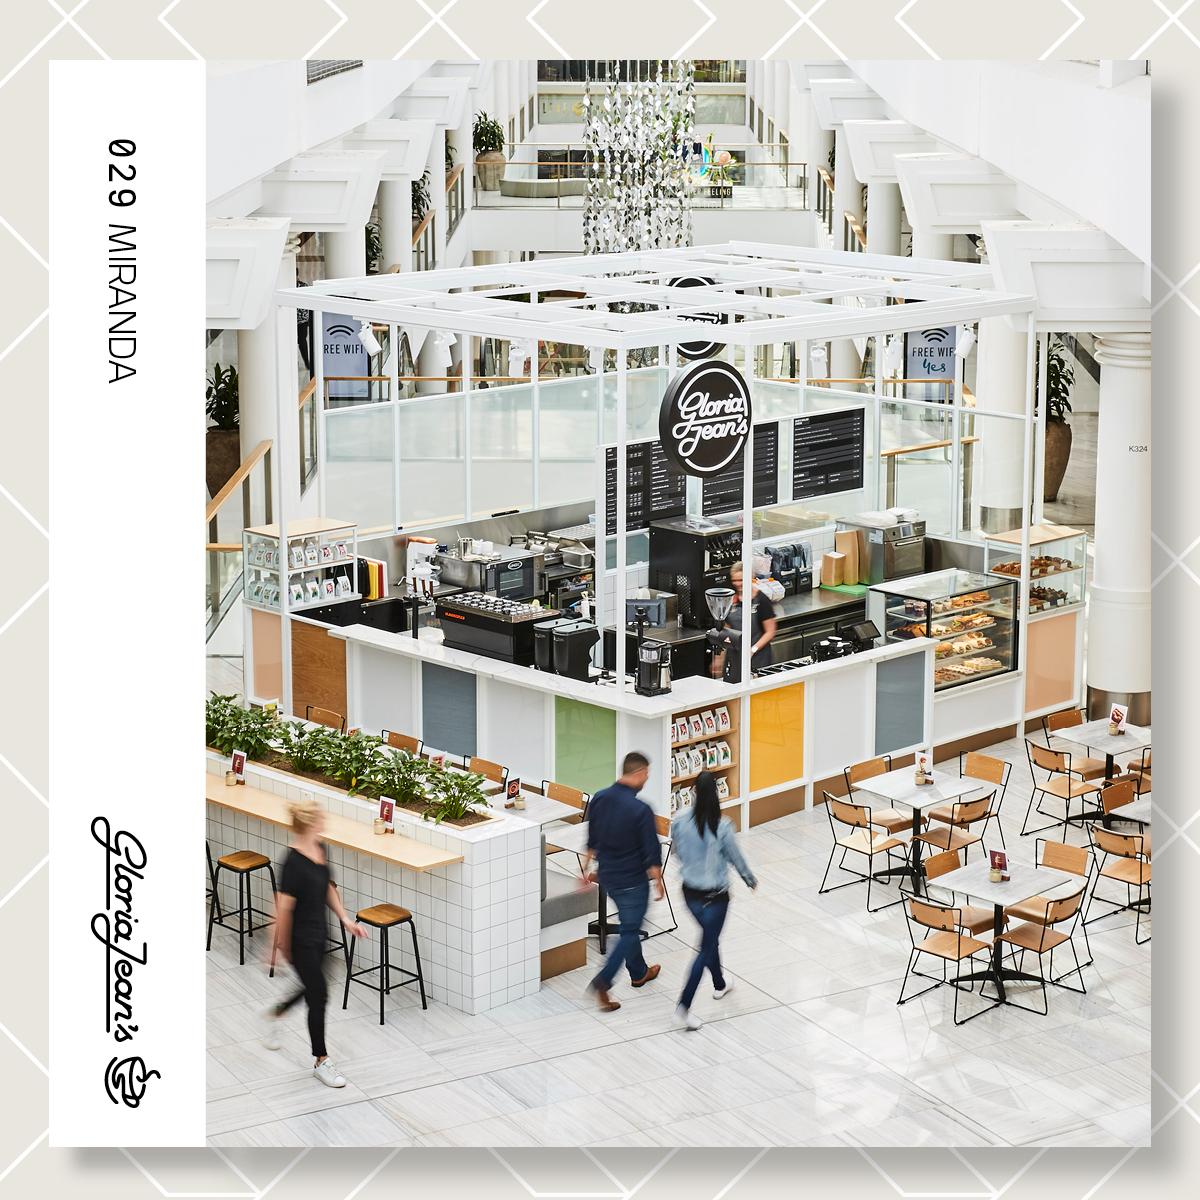 Gloria Jean's Coffees retail café coffee shop available - enquire now!